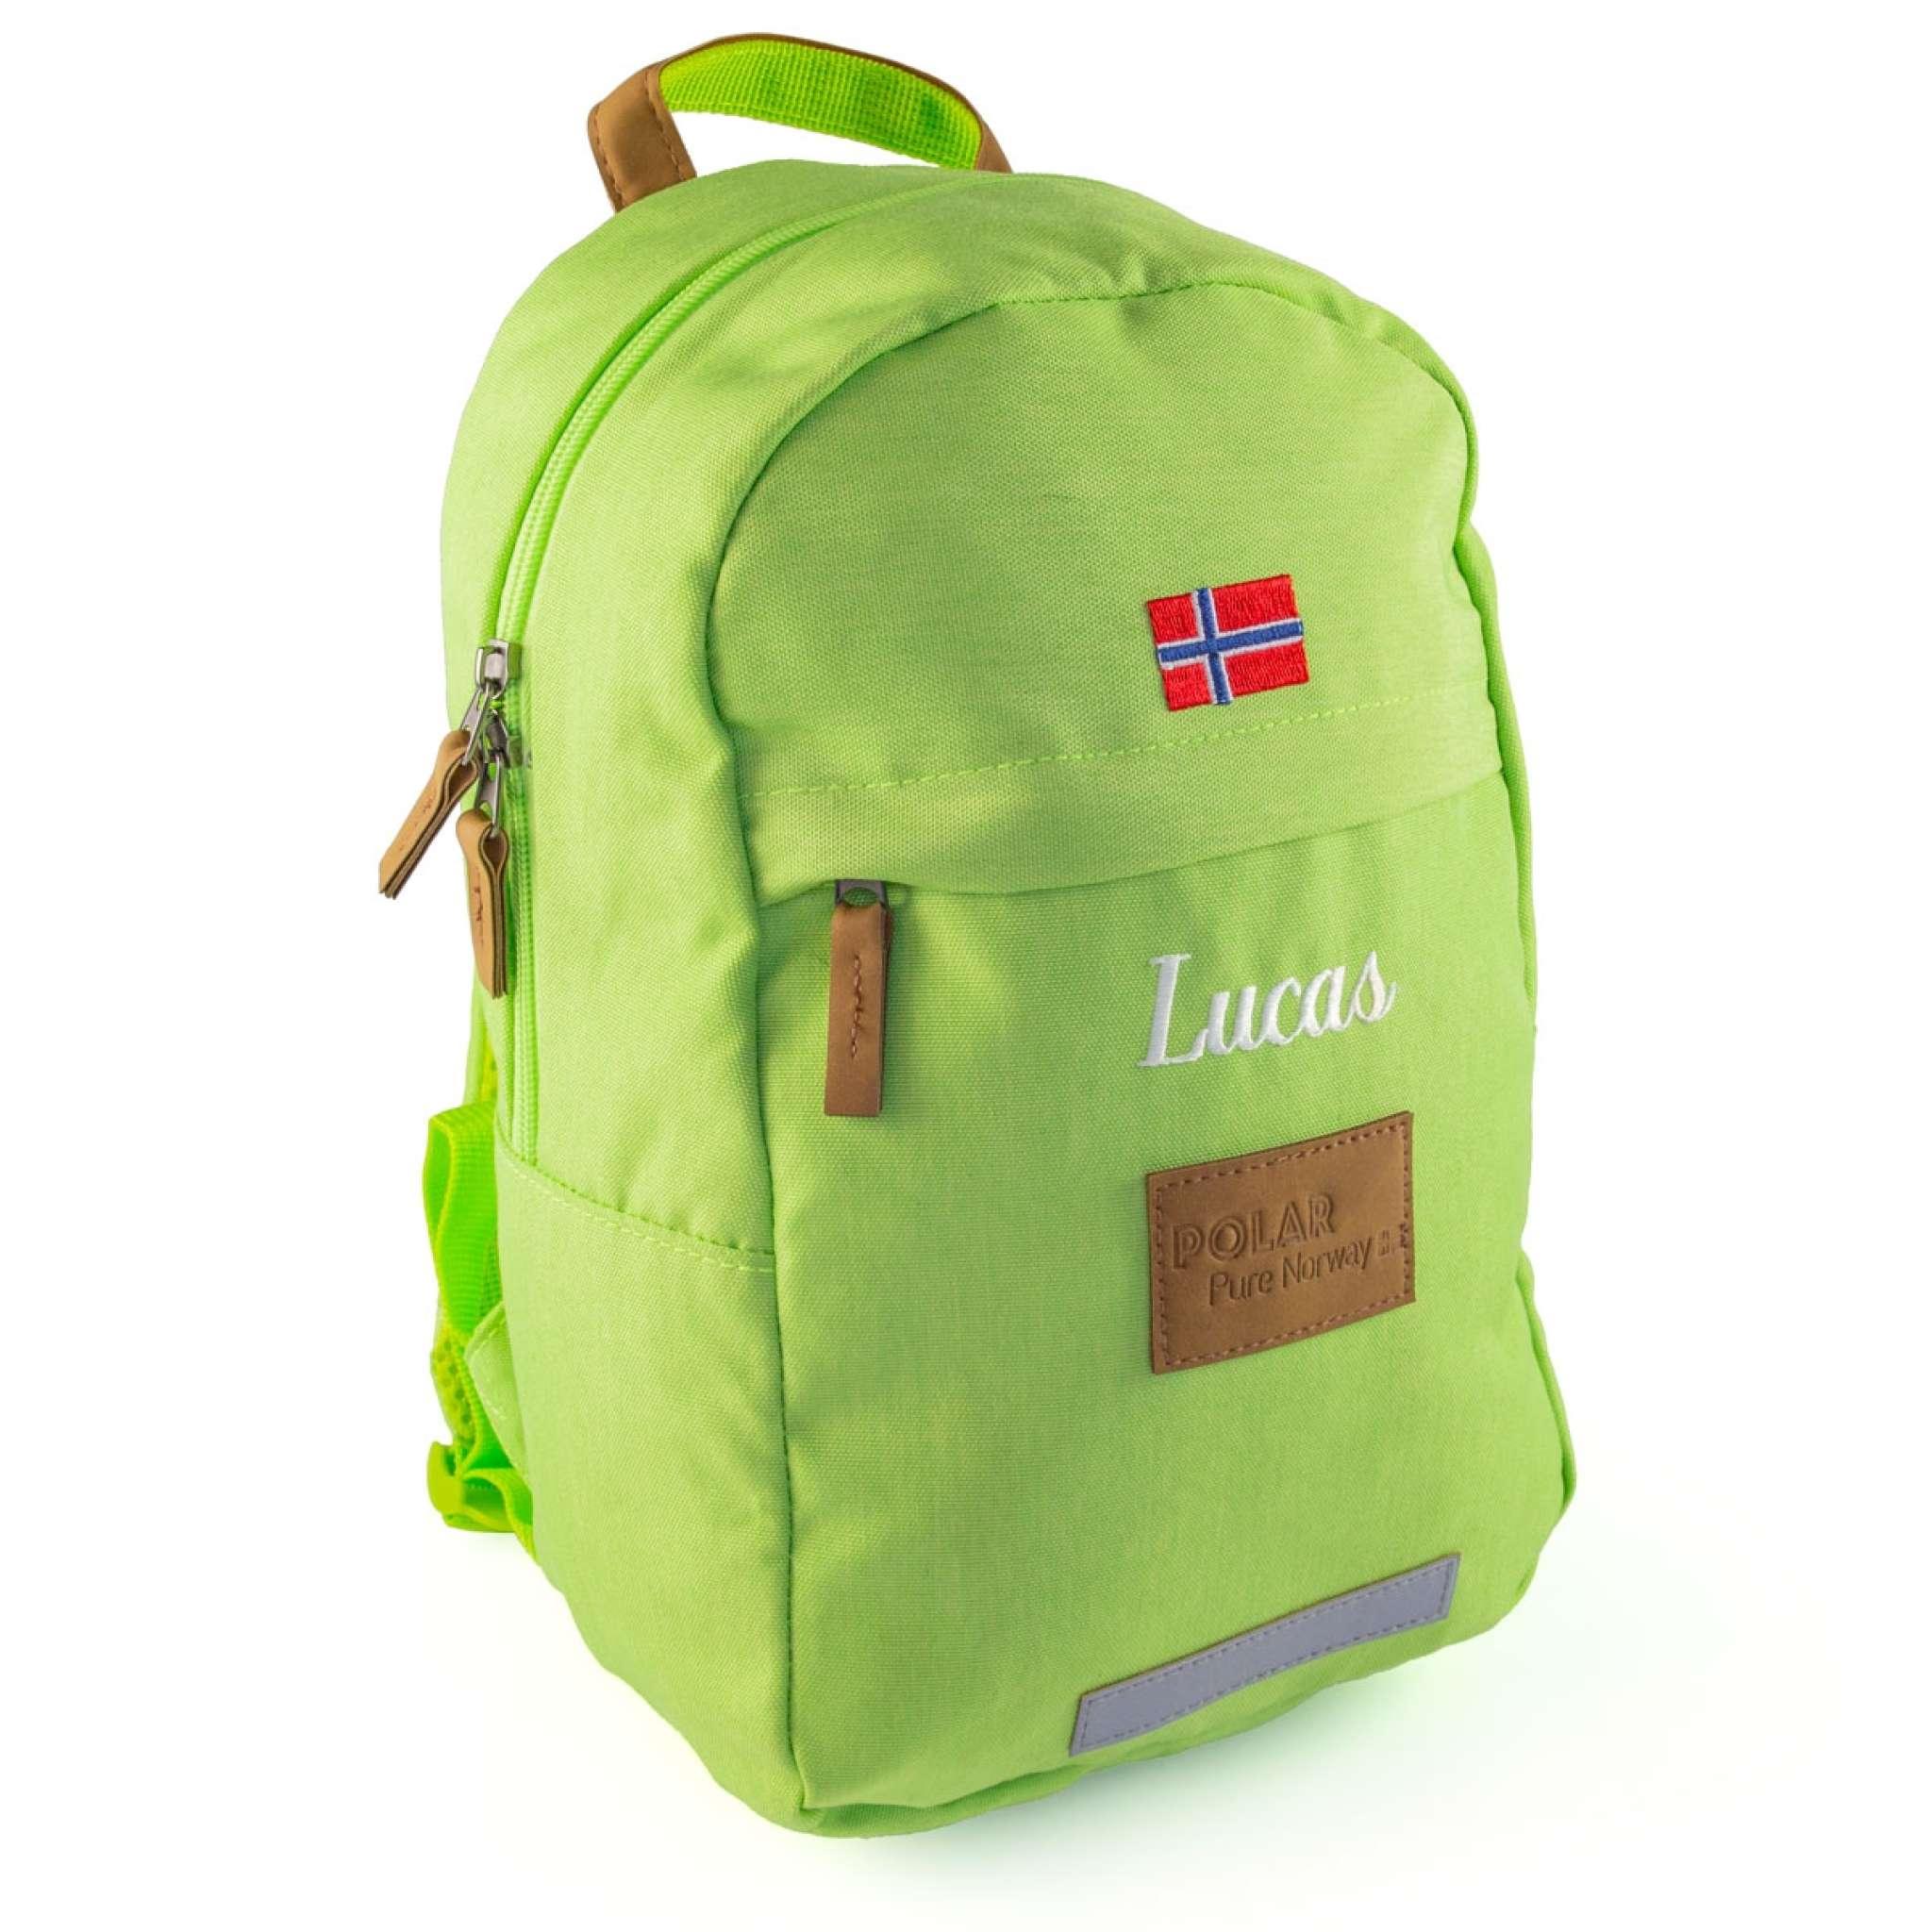 Polar Pure Norway ryggsäck 10 liter, Grön